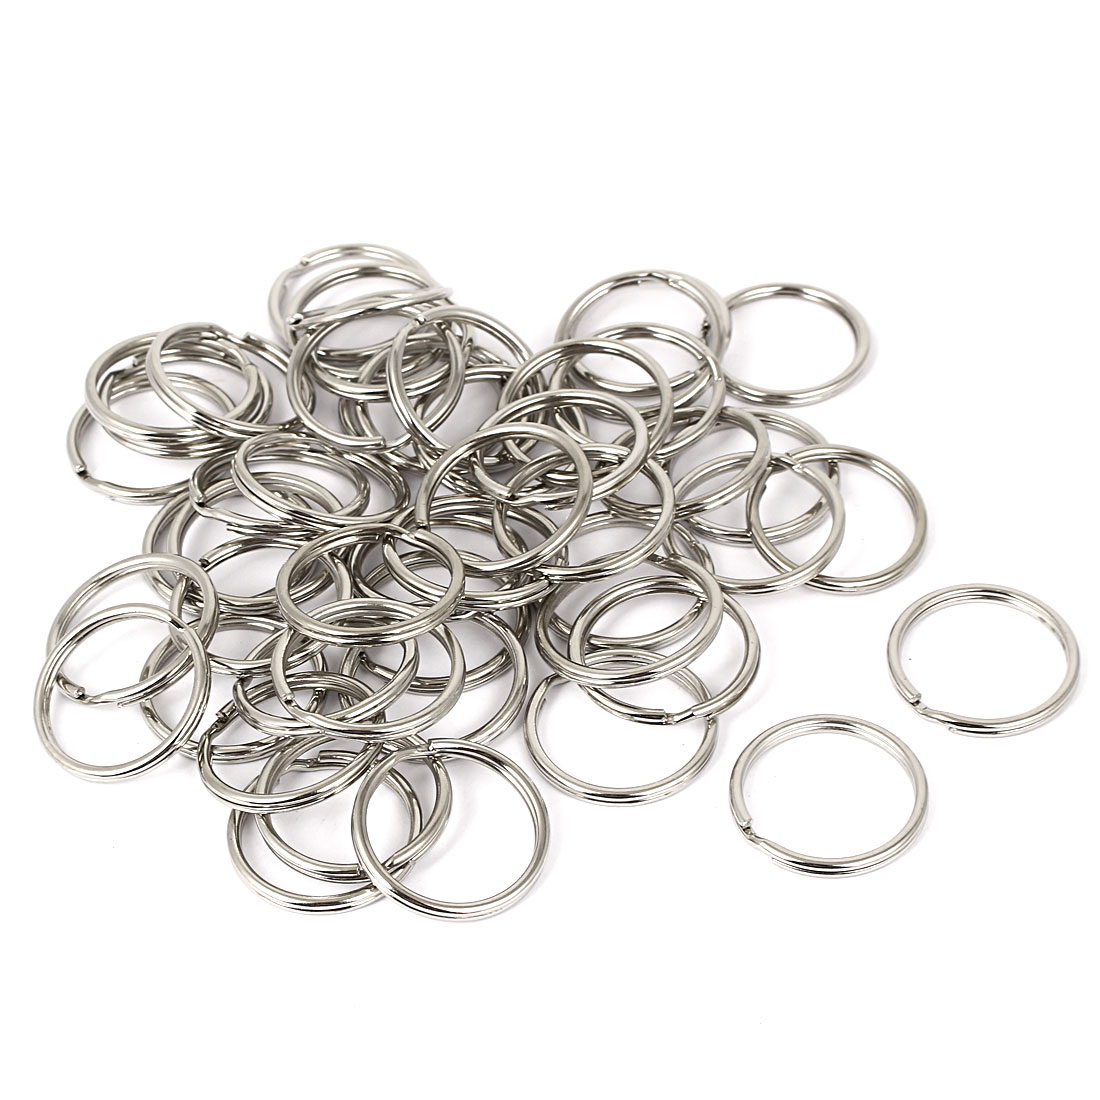 50pcs 28mm Dia Silver Tone Metal Split Ring Keychain Keyring Key Holder